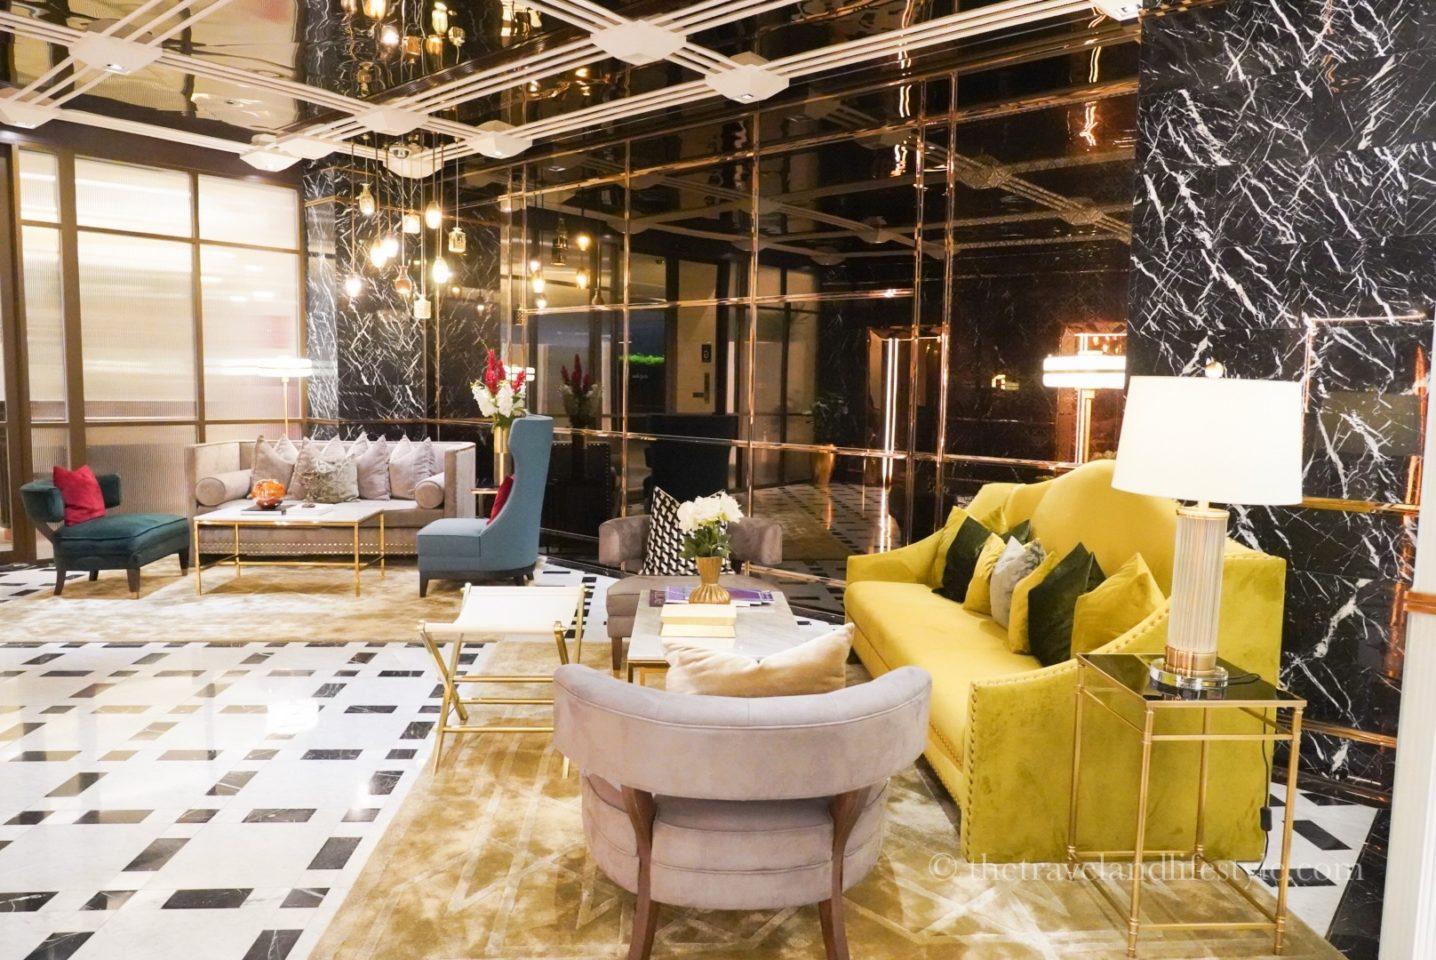 dsc07774 - akyra Thonglor Bangkok -  バンコクのラグジュアリーデザイナーズホテル